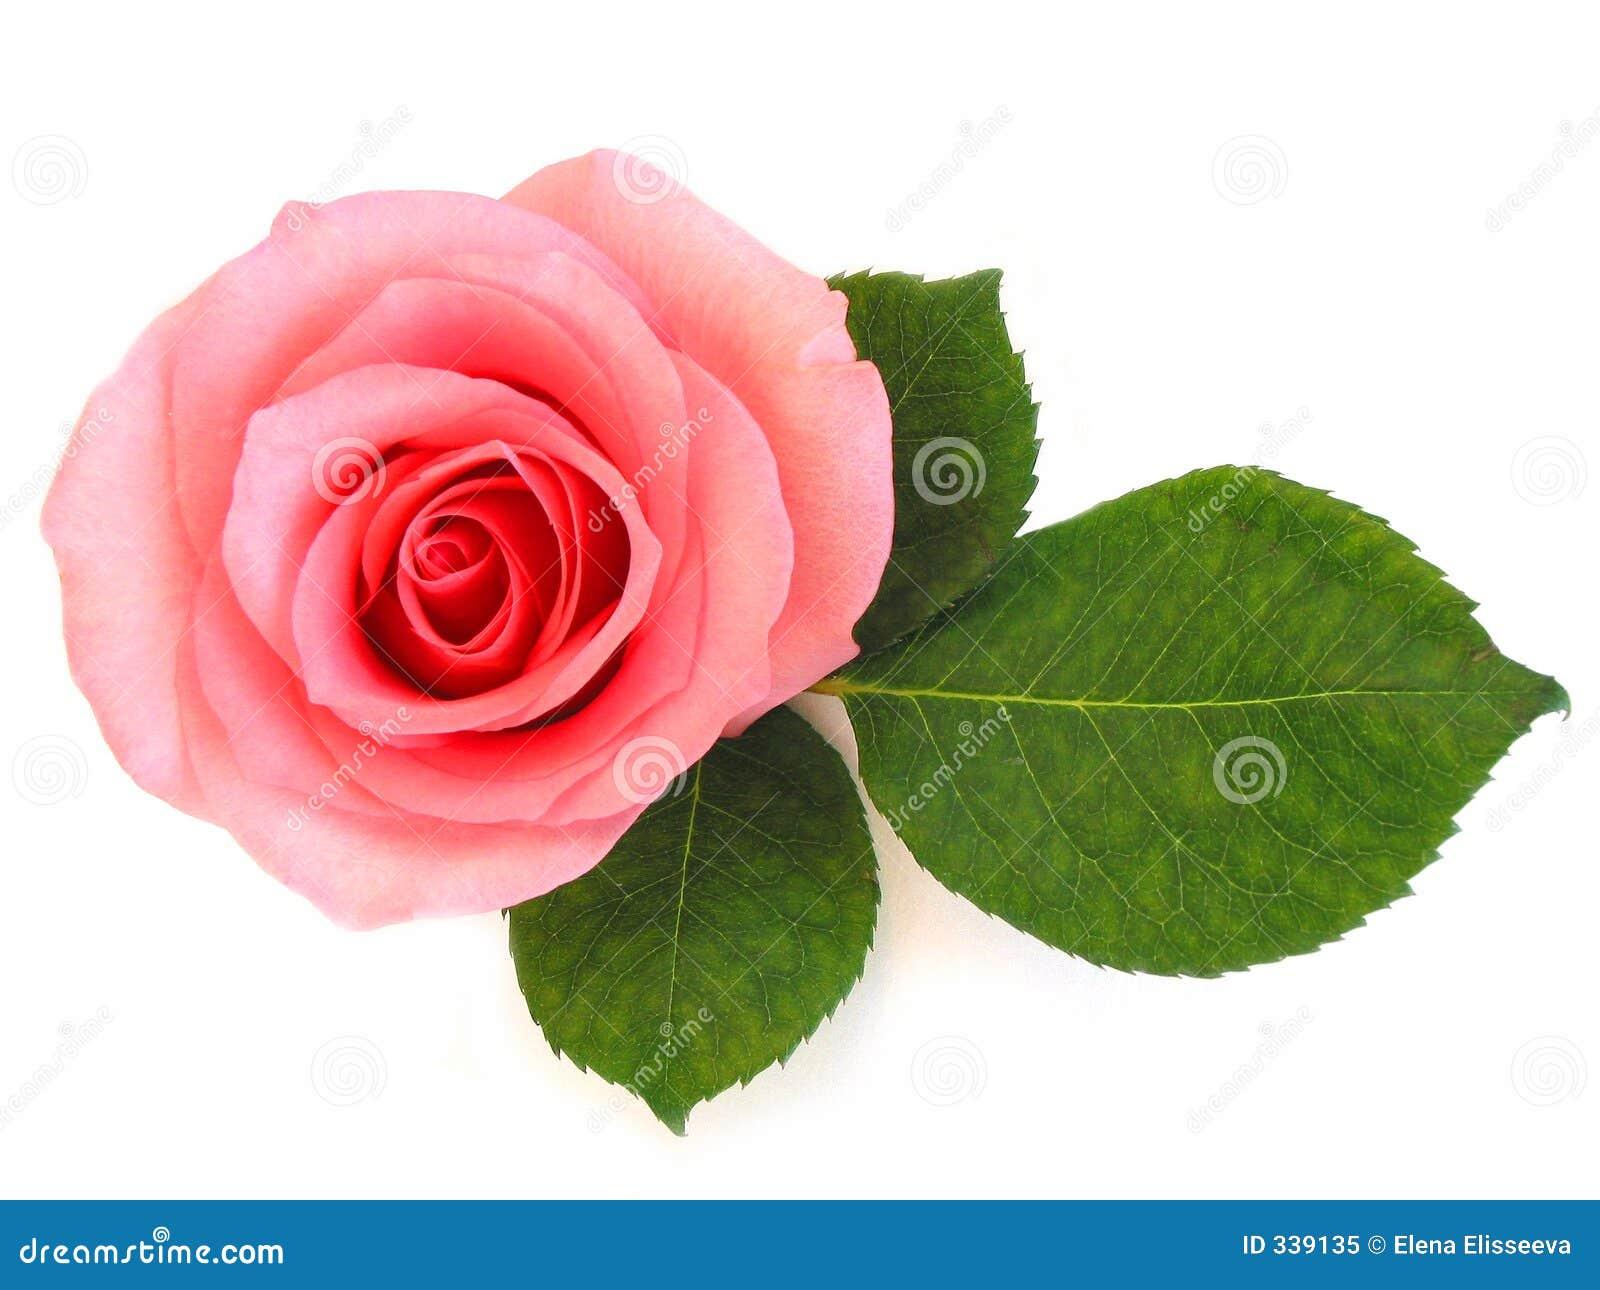 Getrenntes Rosa stieg mit grünem Blatt